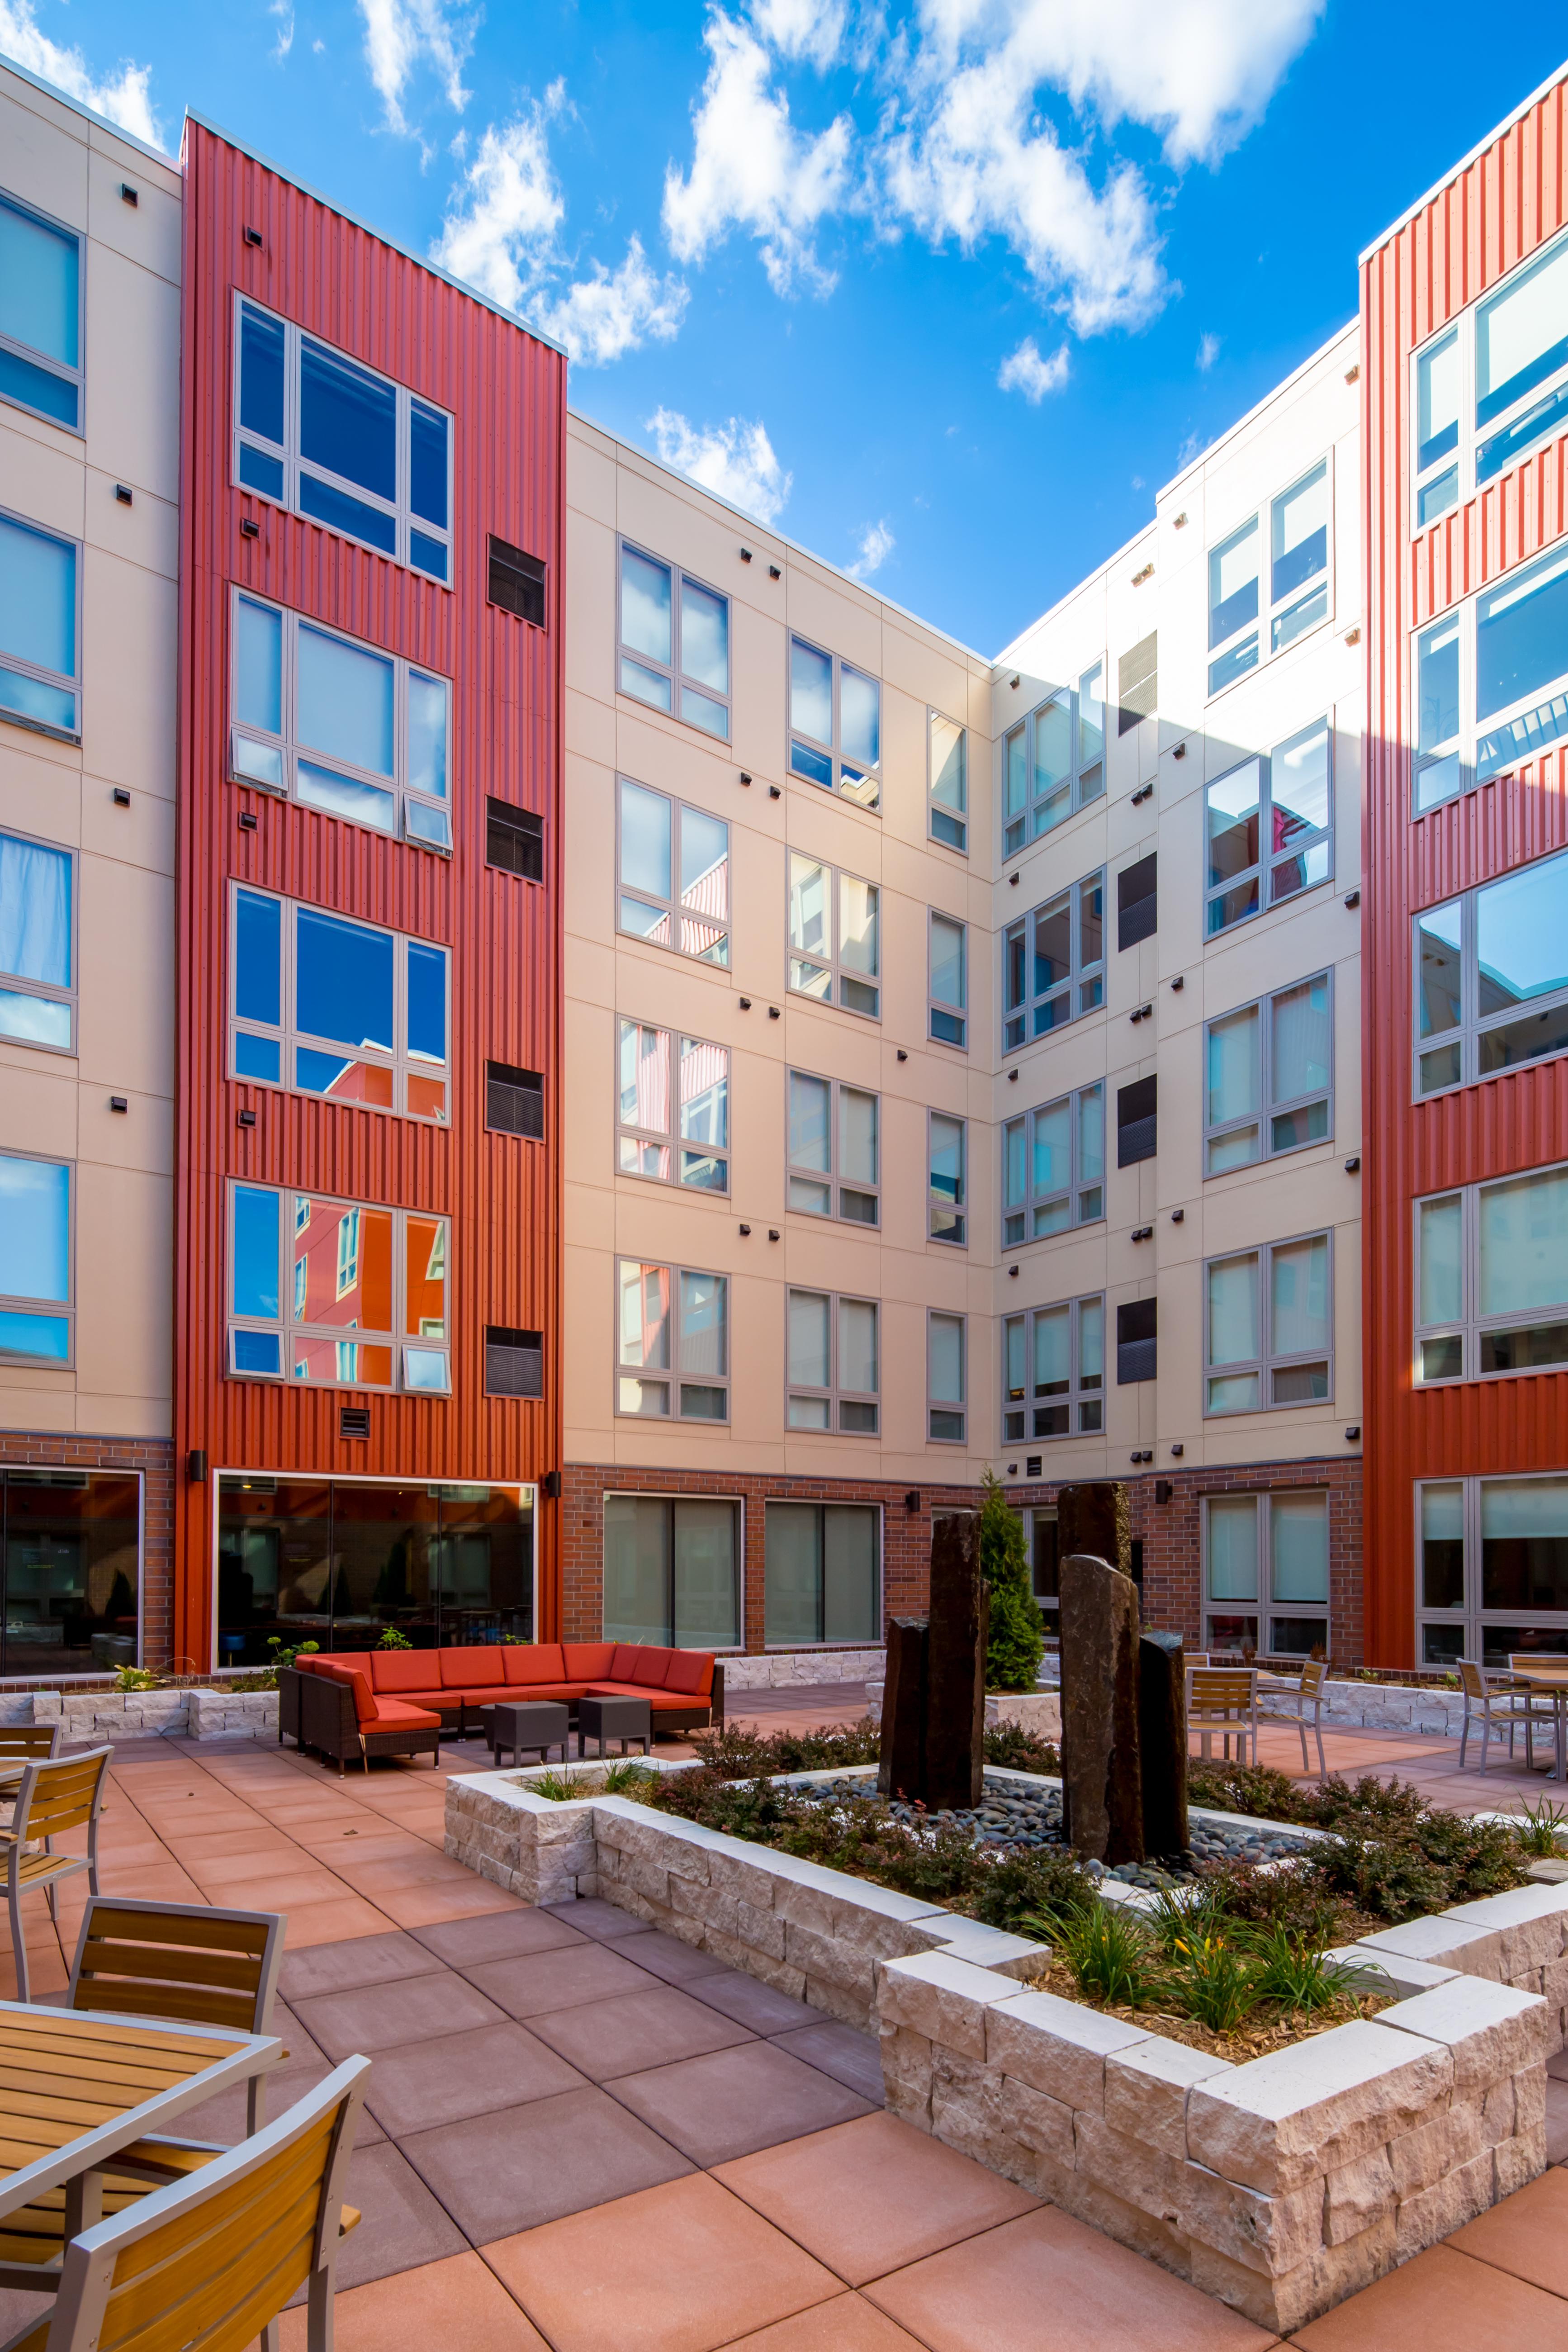 Cheap Apartments Near University Of Minnesota